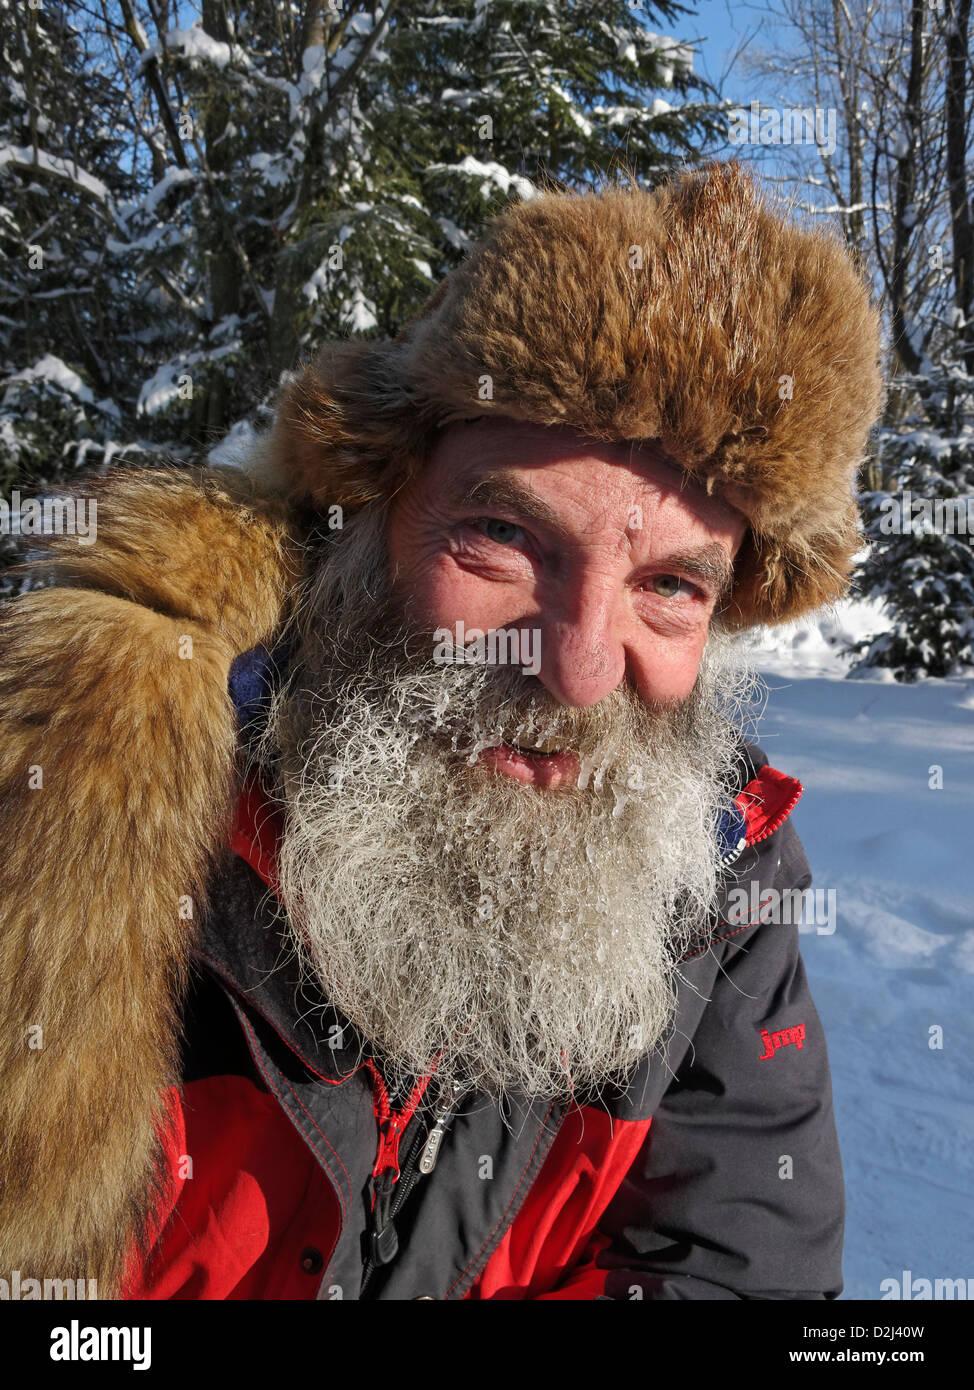 The musher for the 'Fun Dog' husky sleigh ride company. Zakopane, Poland. - Stock Image